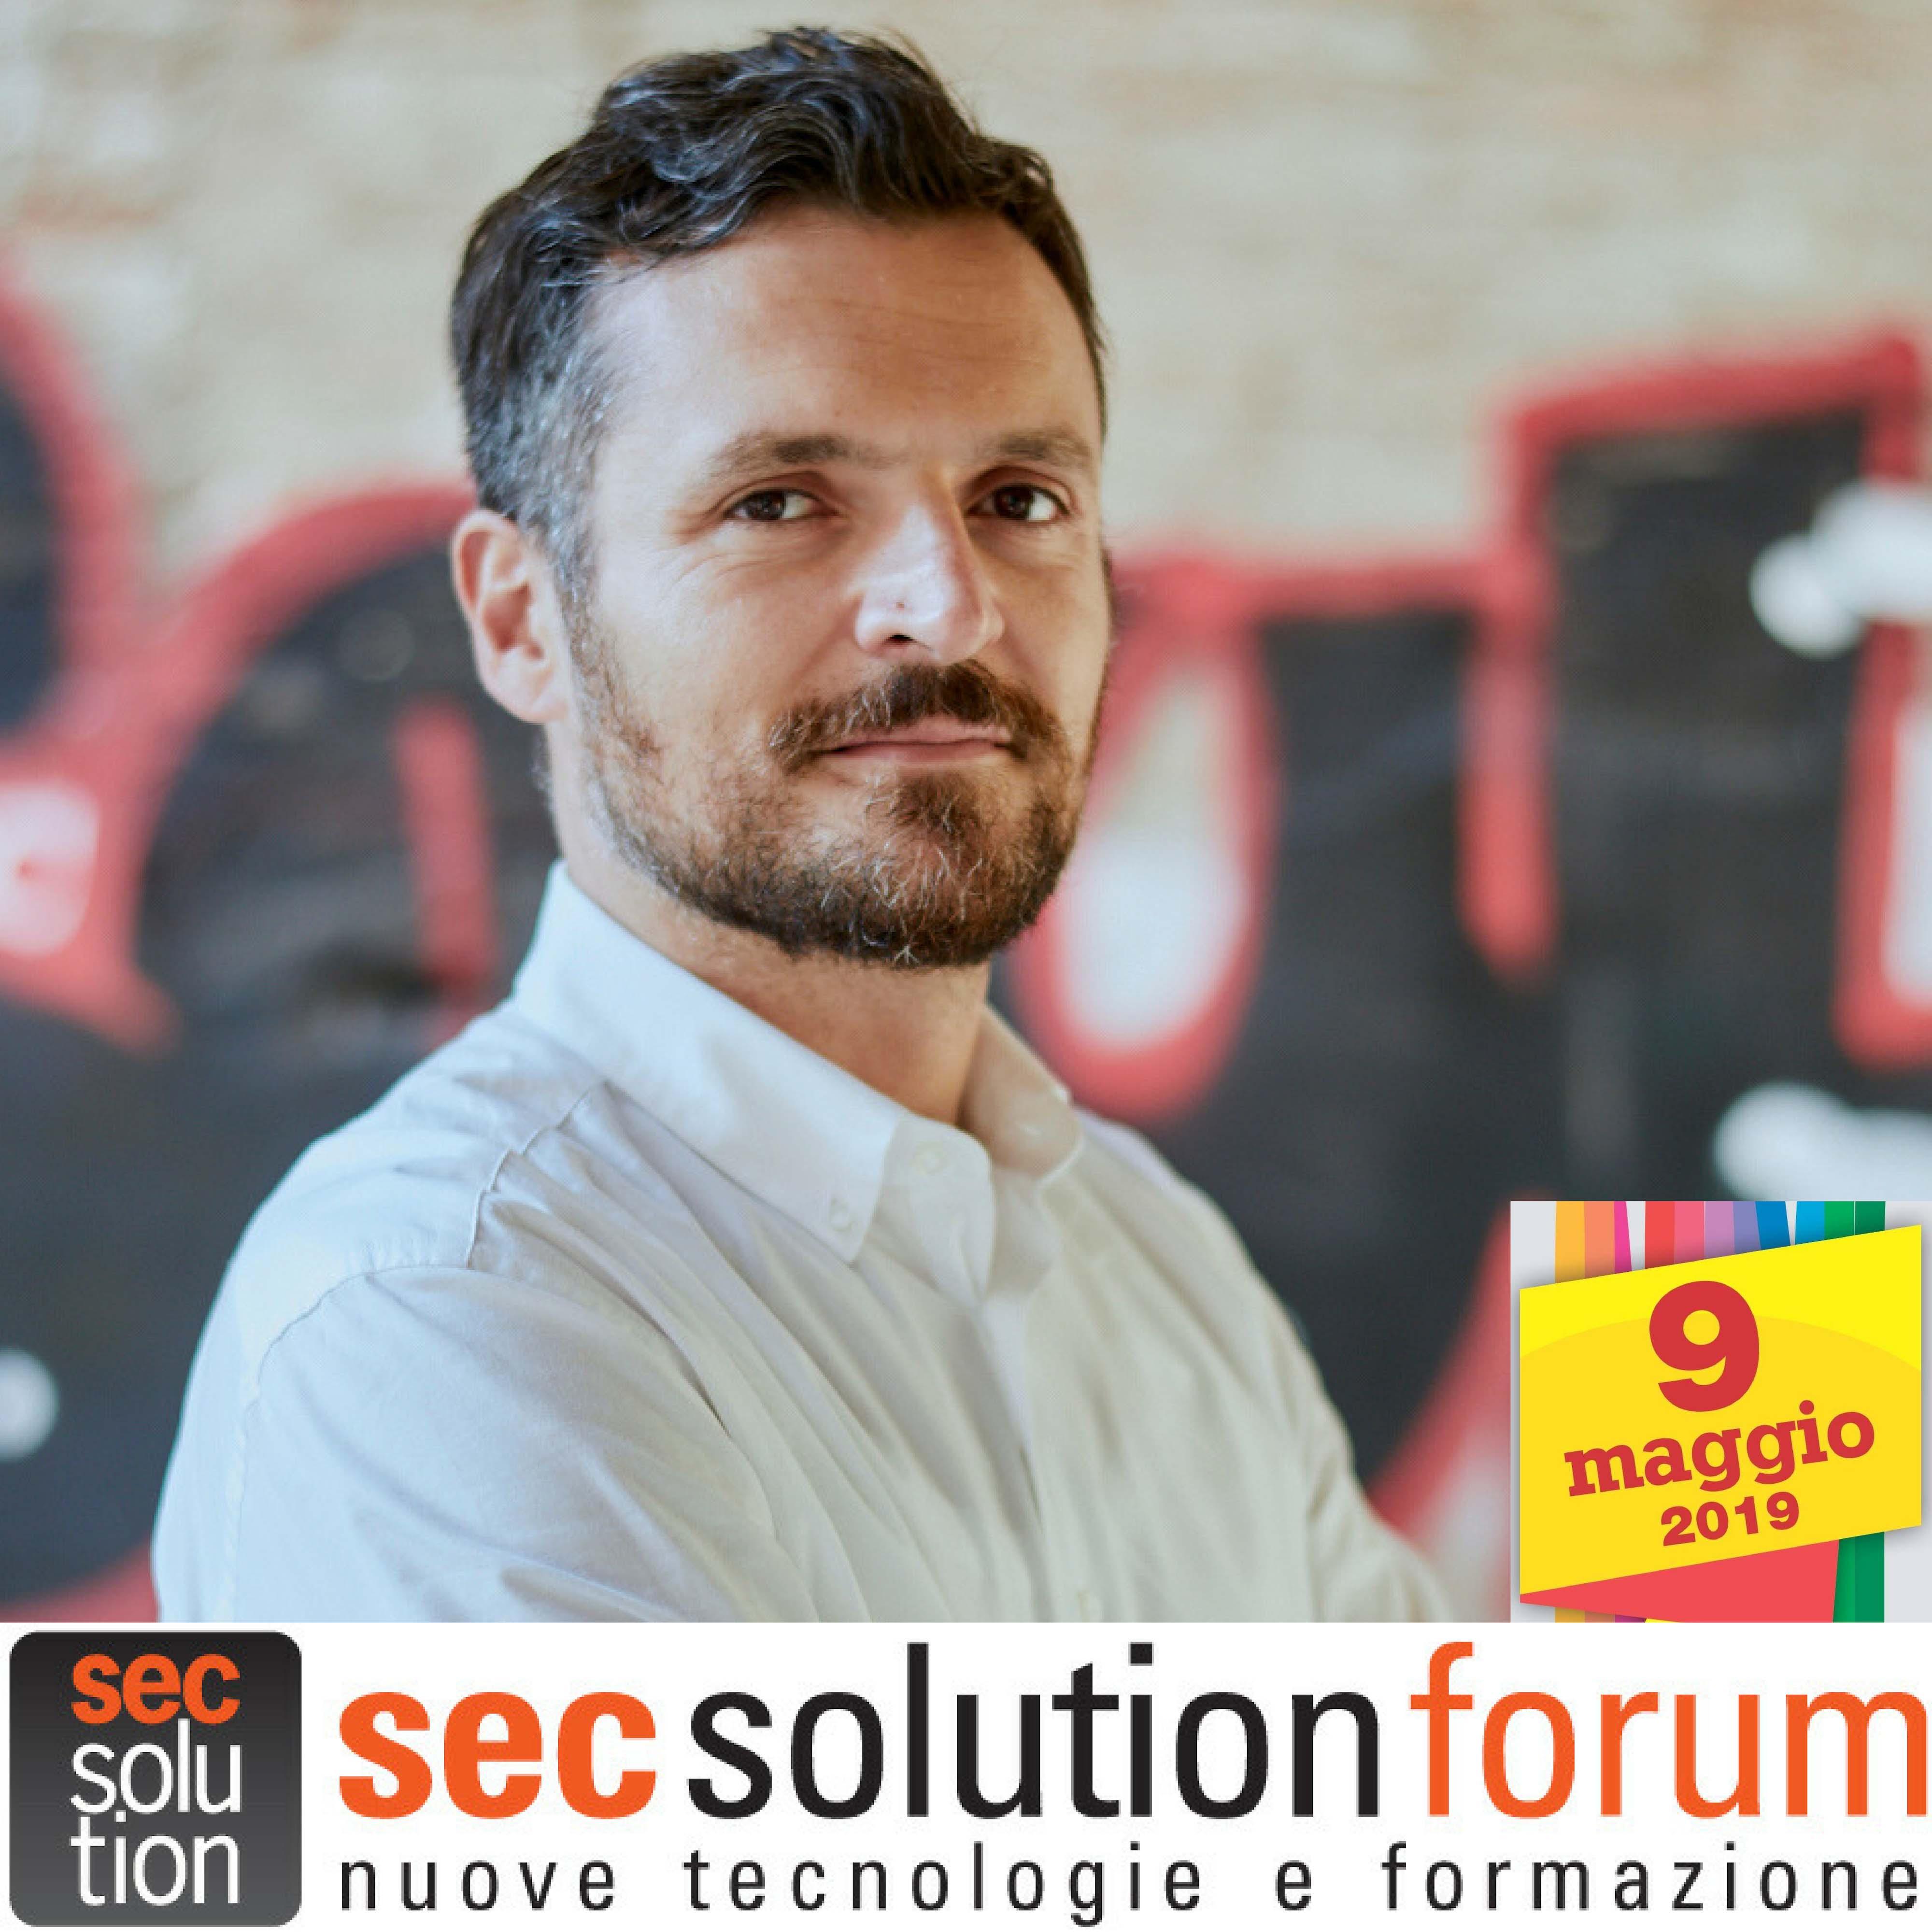 Spark Sec Solution Forum 2019